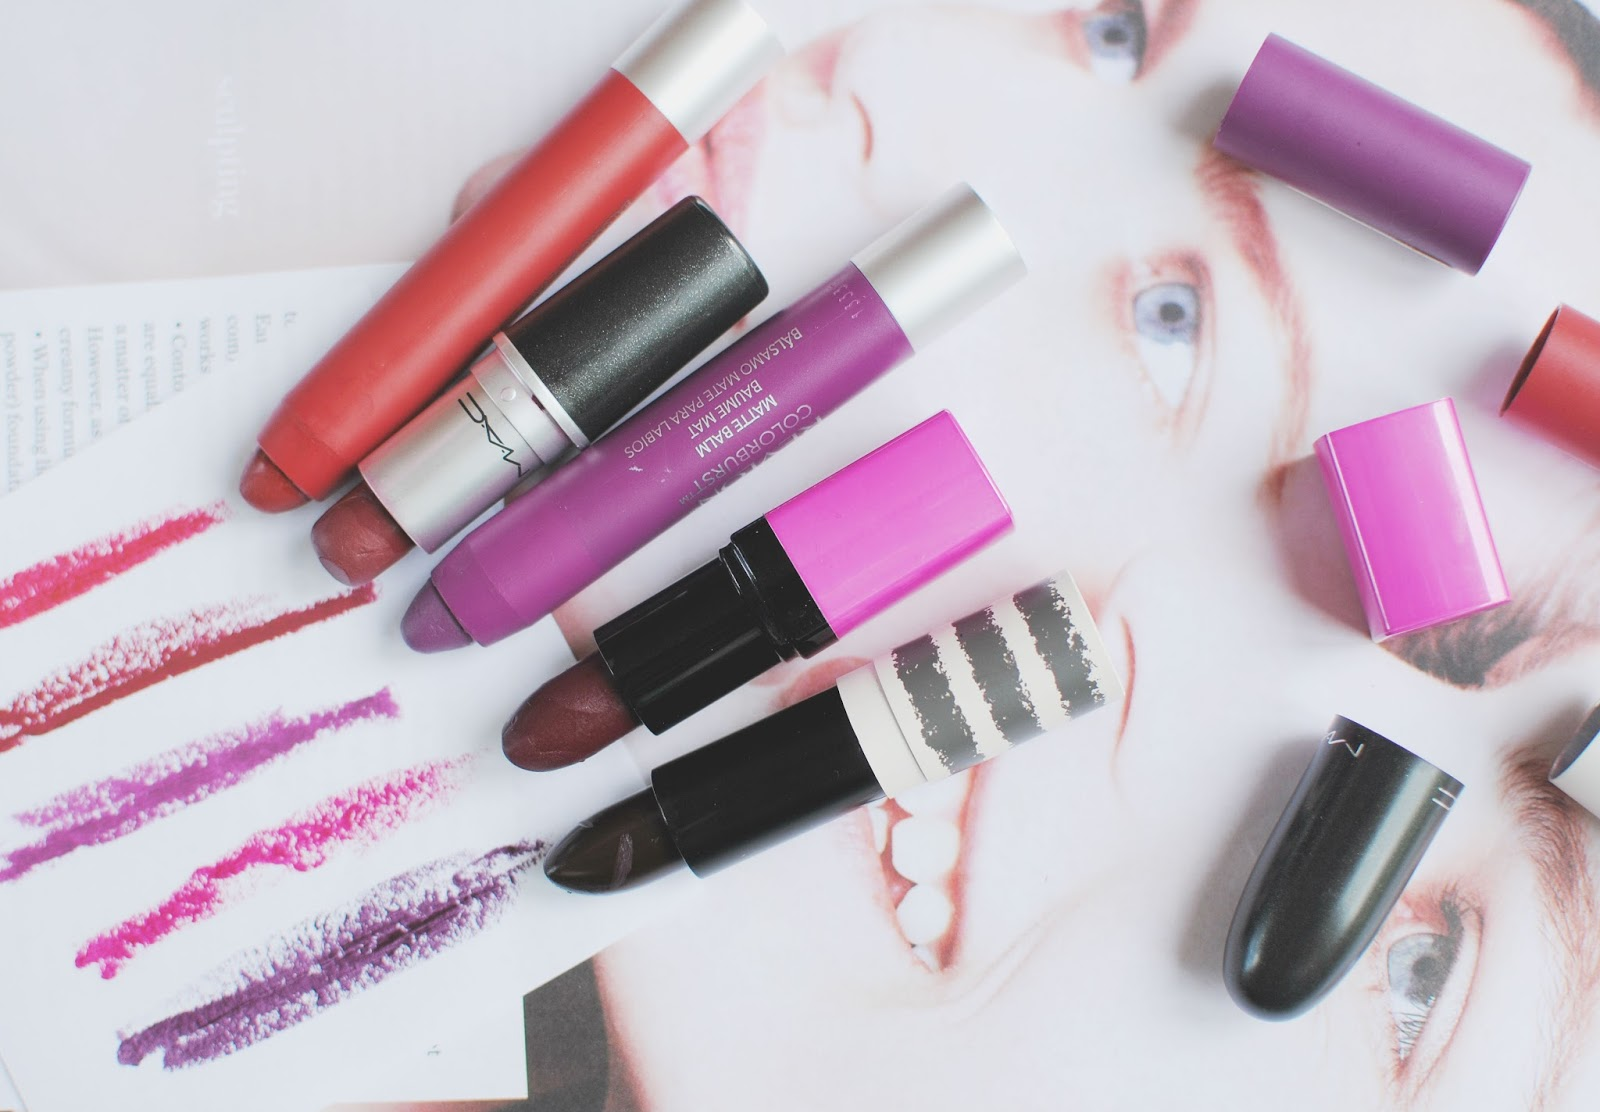 blod lips , revlon, topshop, mac, barry m